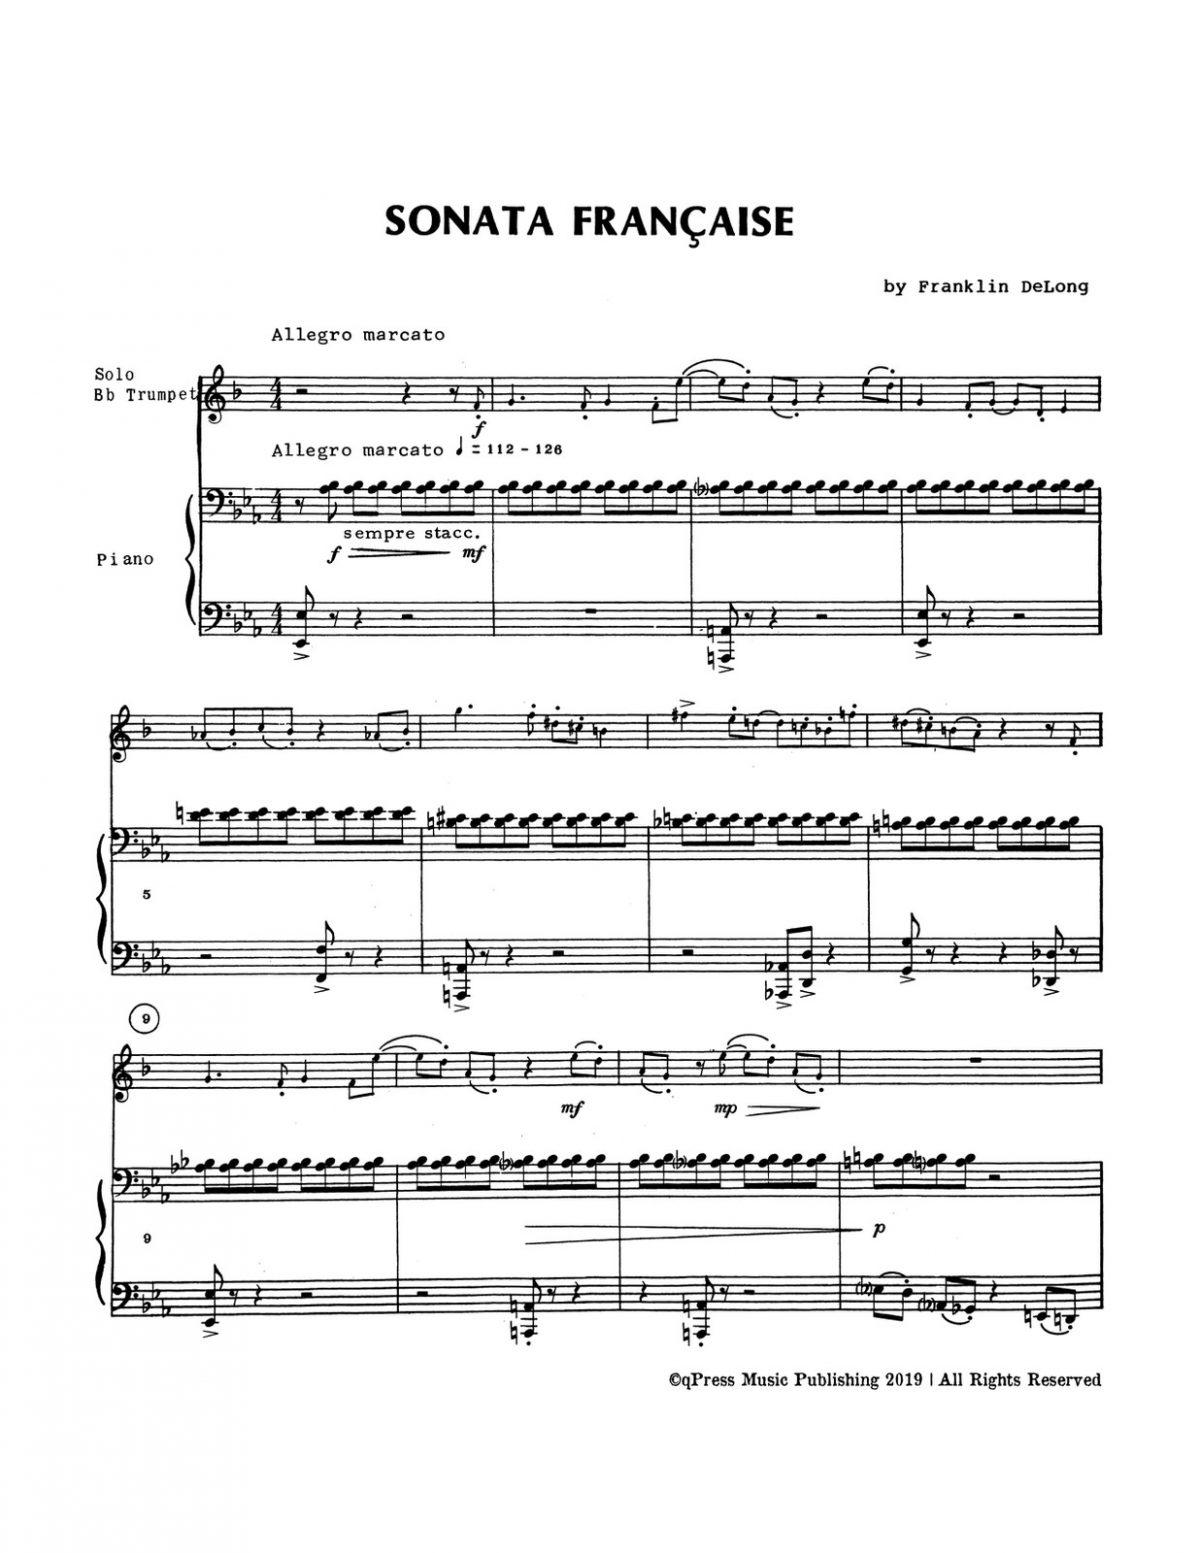 DeLong, Sonata Française-p07